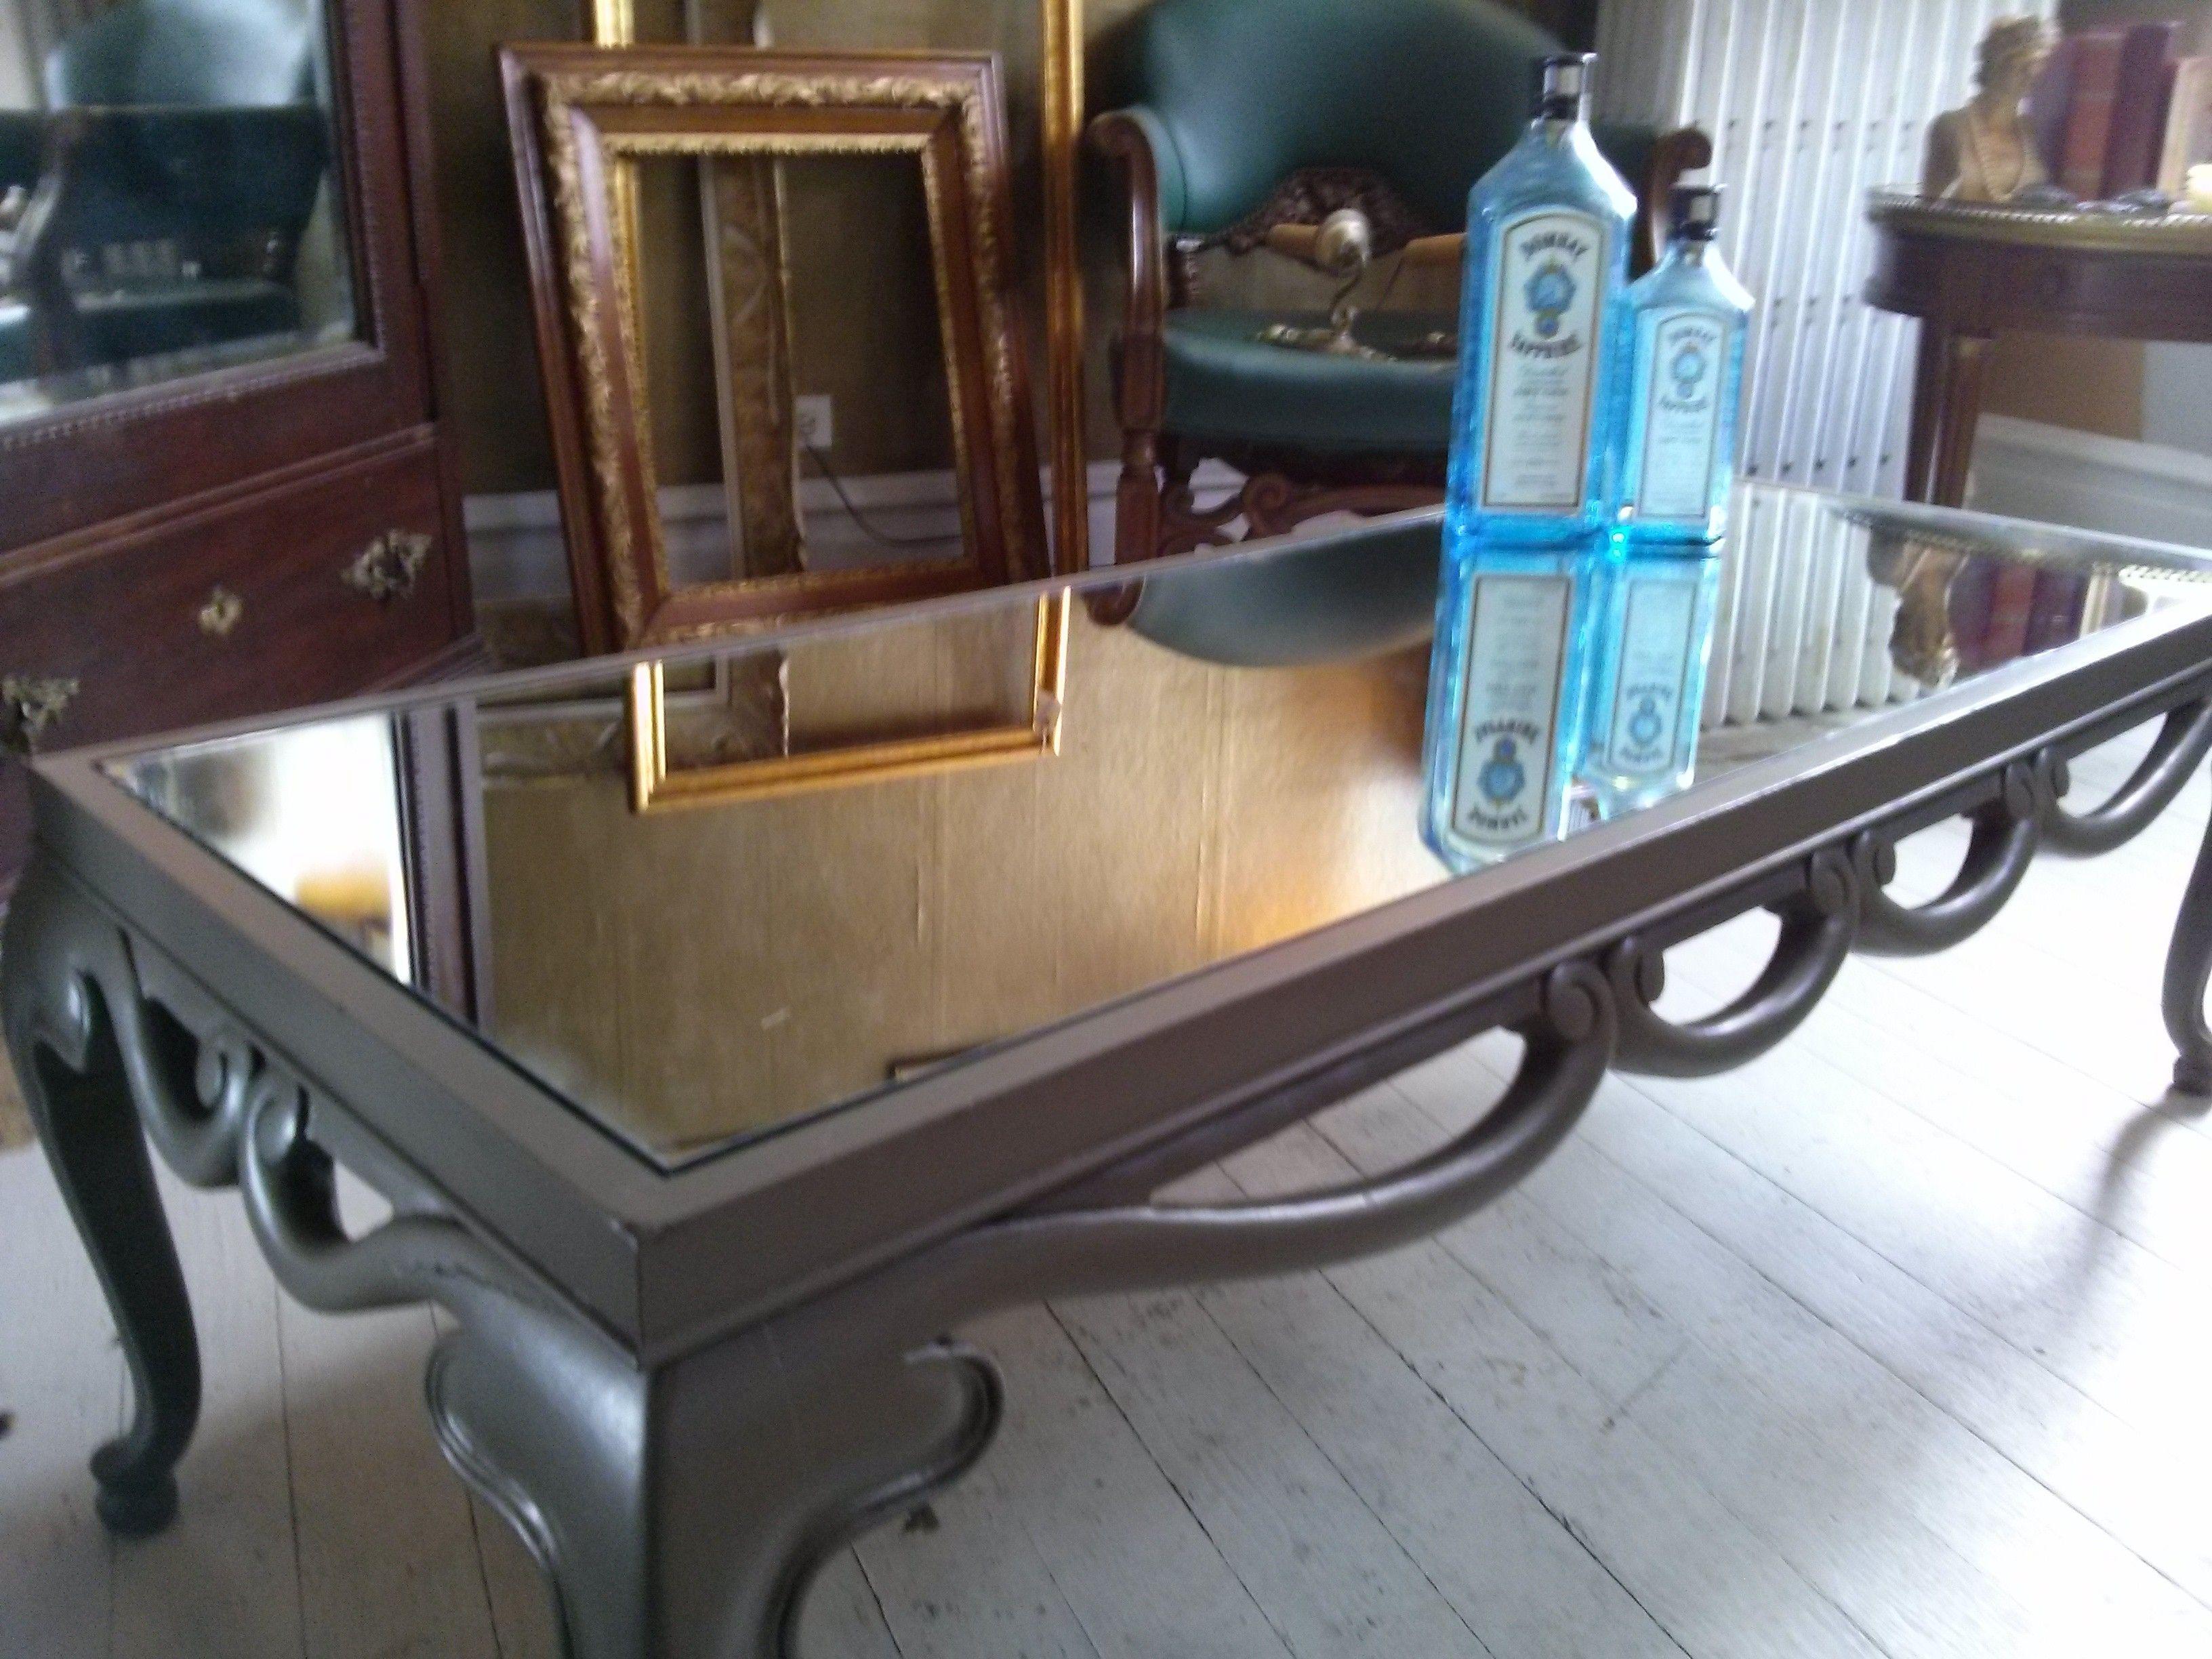 Glamorous Mirrored Coffee Table $425 Wilmette furnishly